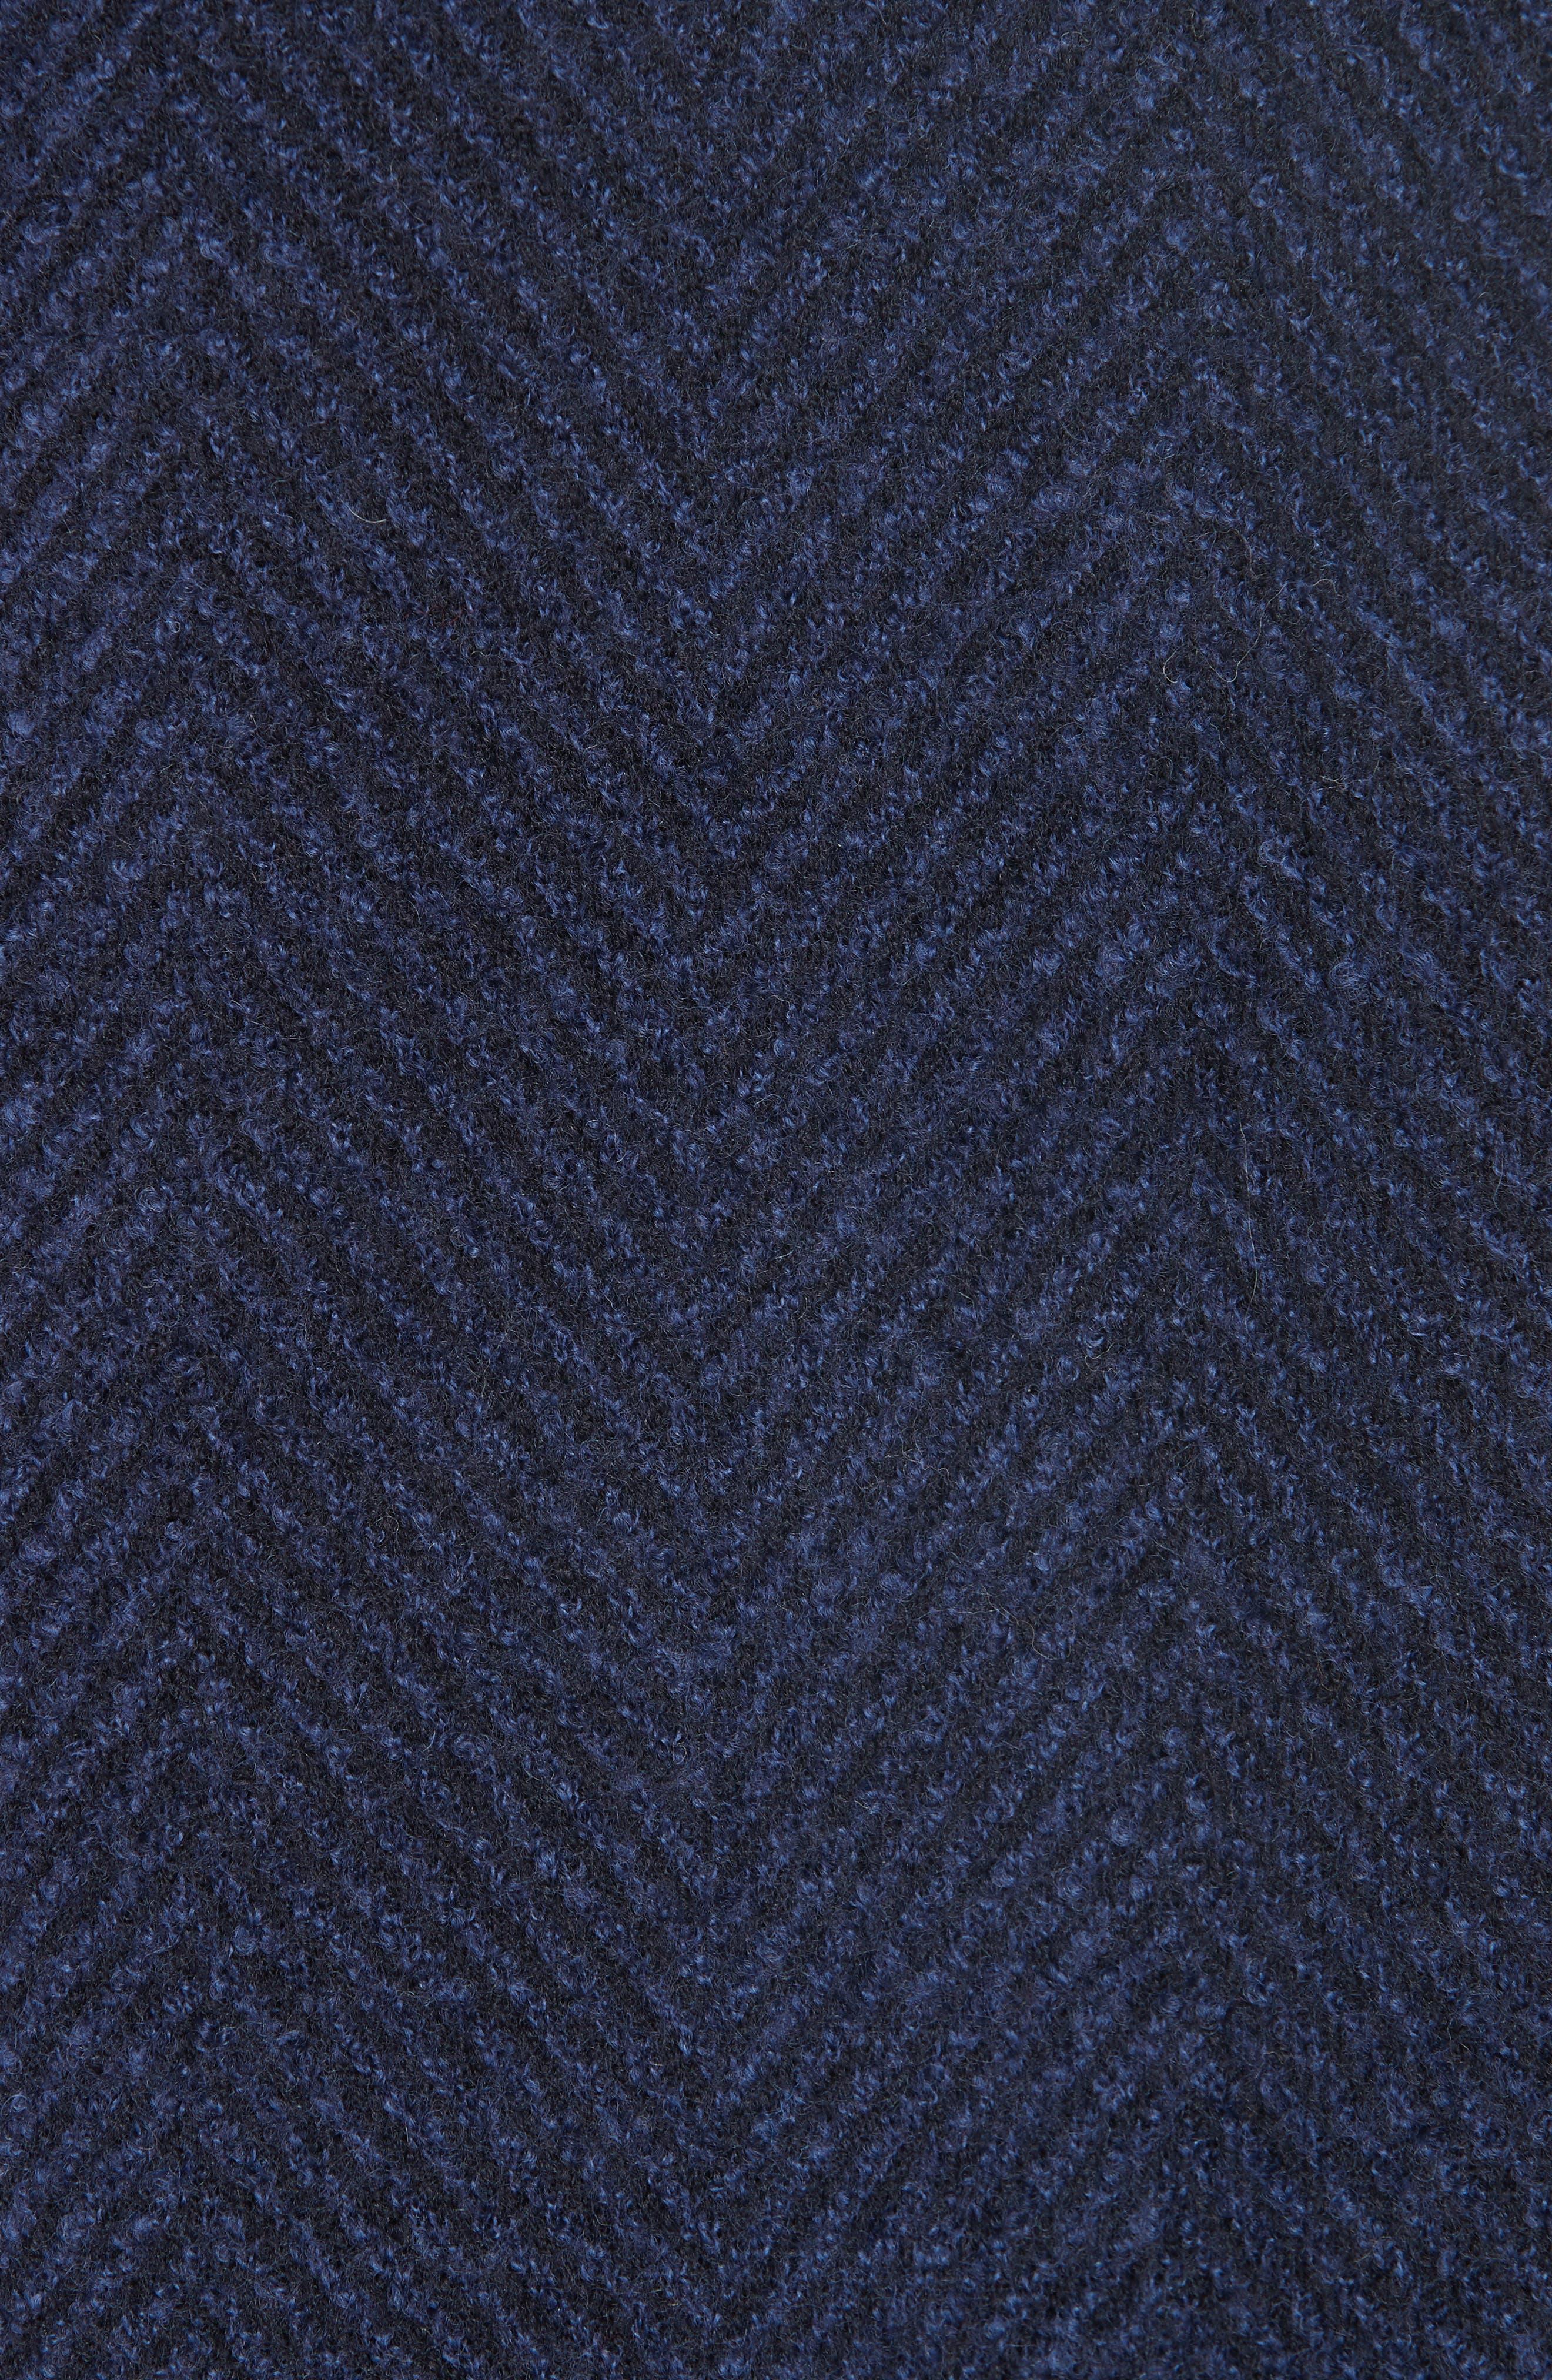 Herringbone Wool Coat,                             Alternate thumbnail 7, color,                             NAVY BLUE